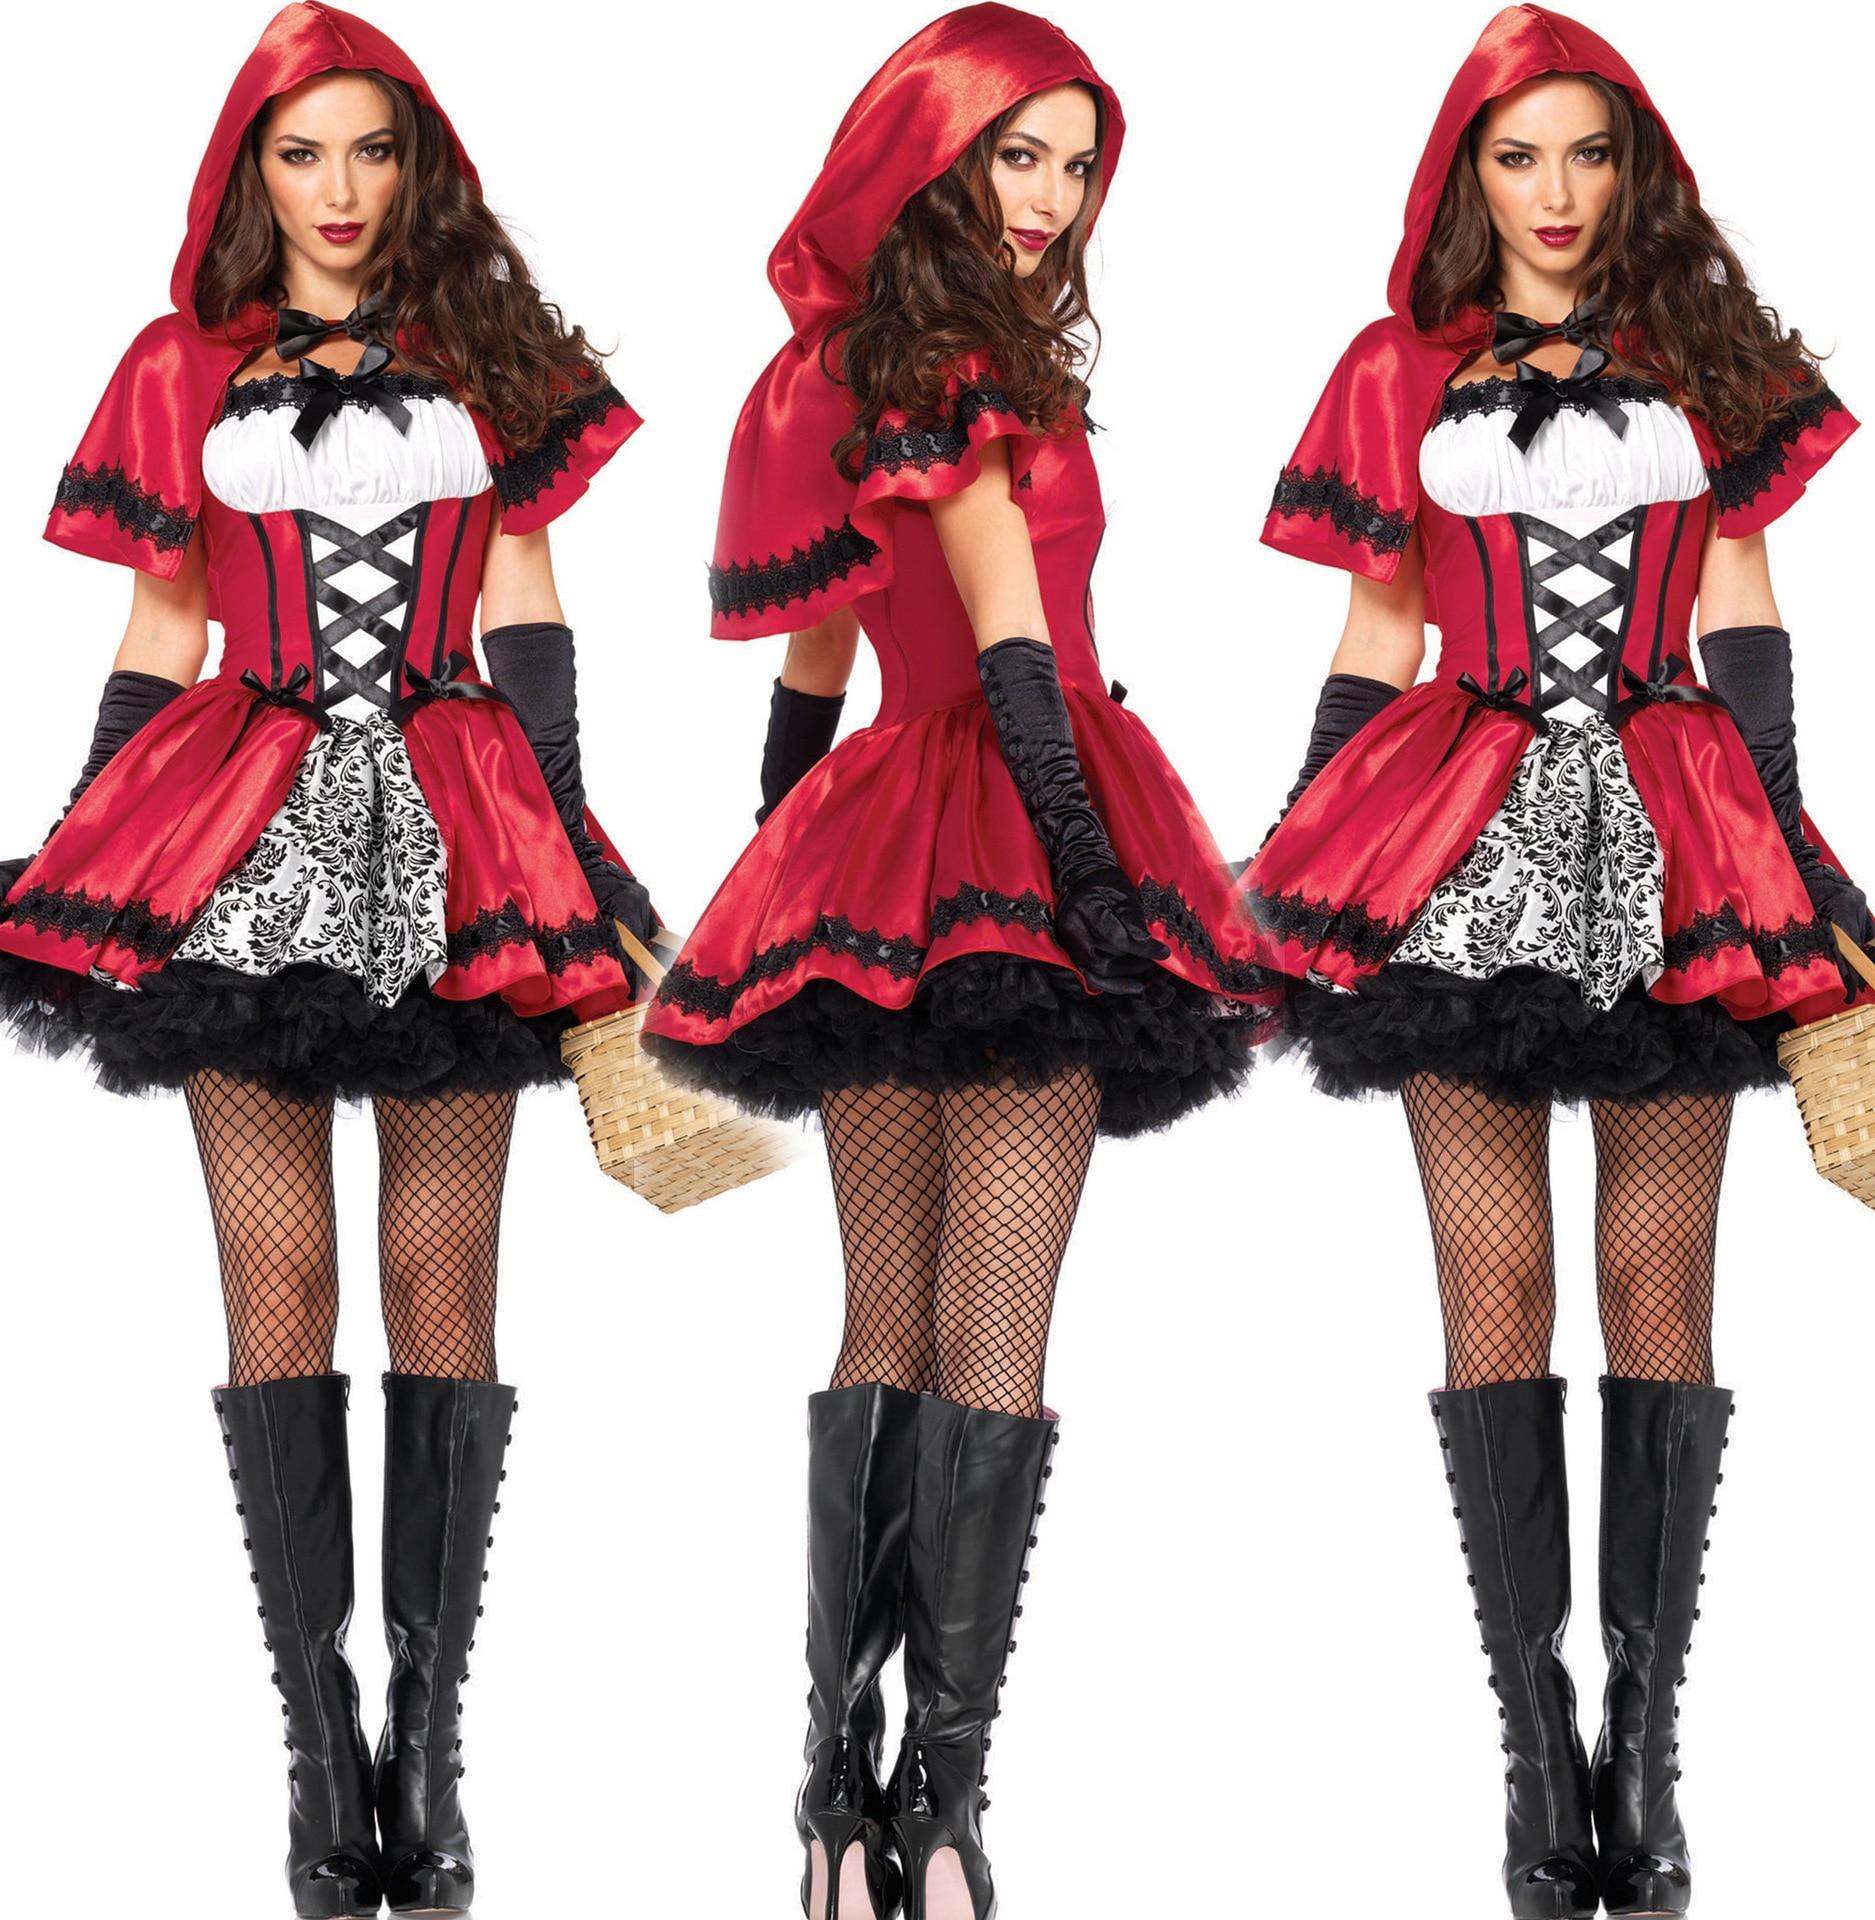 Women Sexy Little Red Riding Hood Adult Costume Fancy Dress Up ...